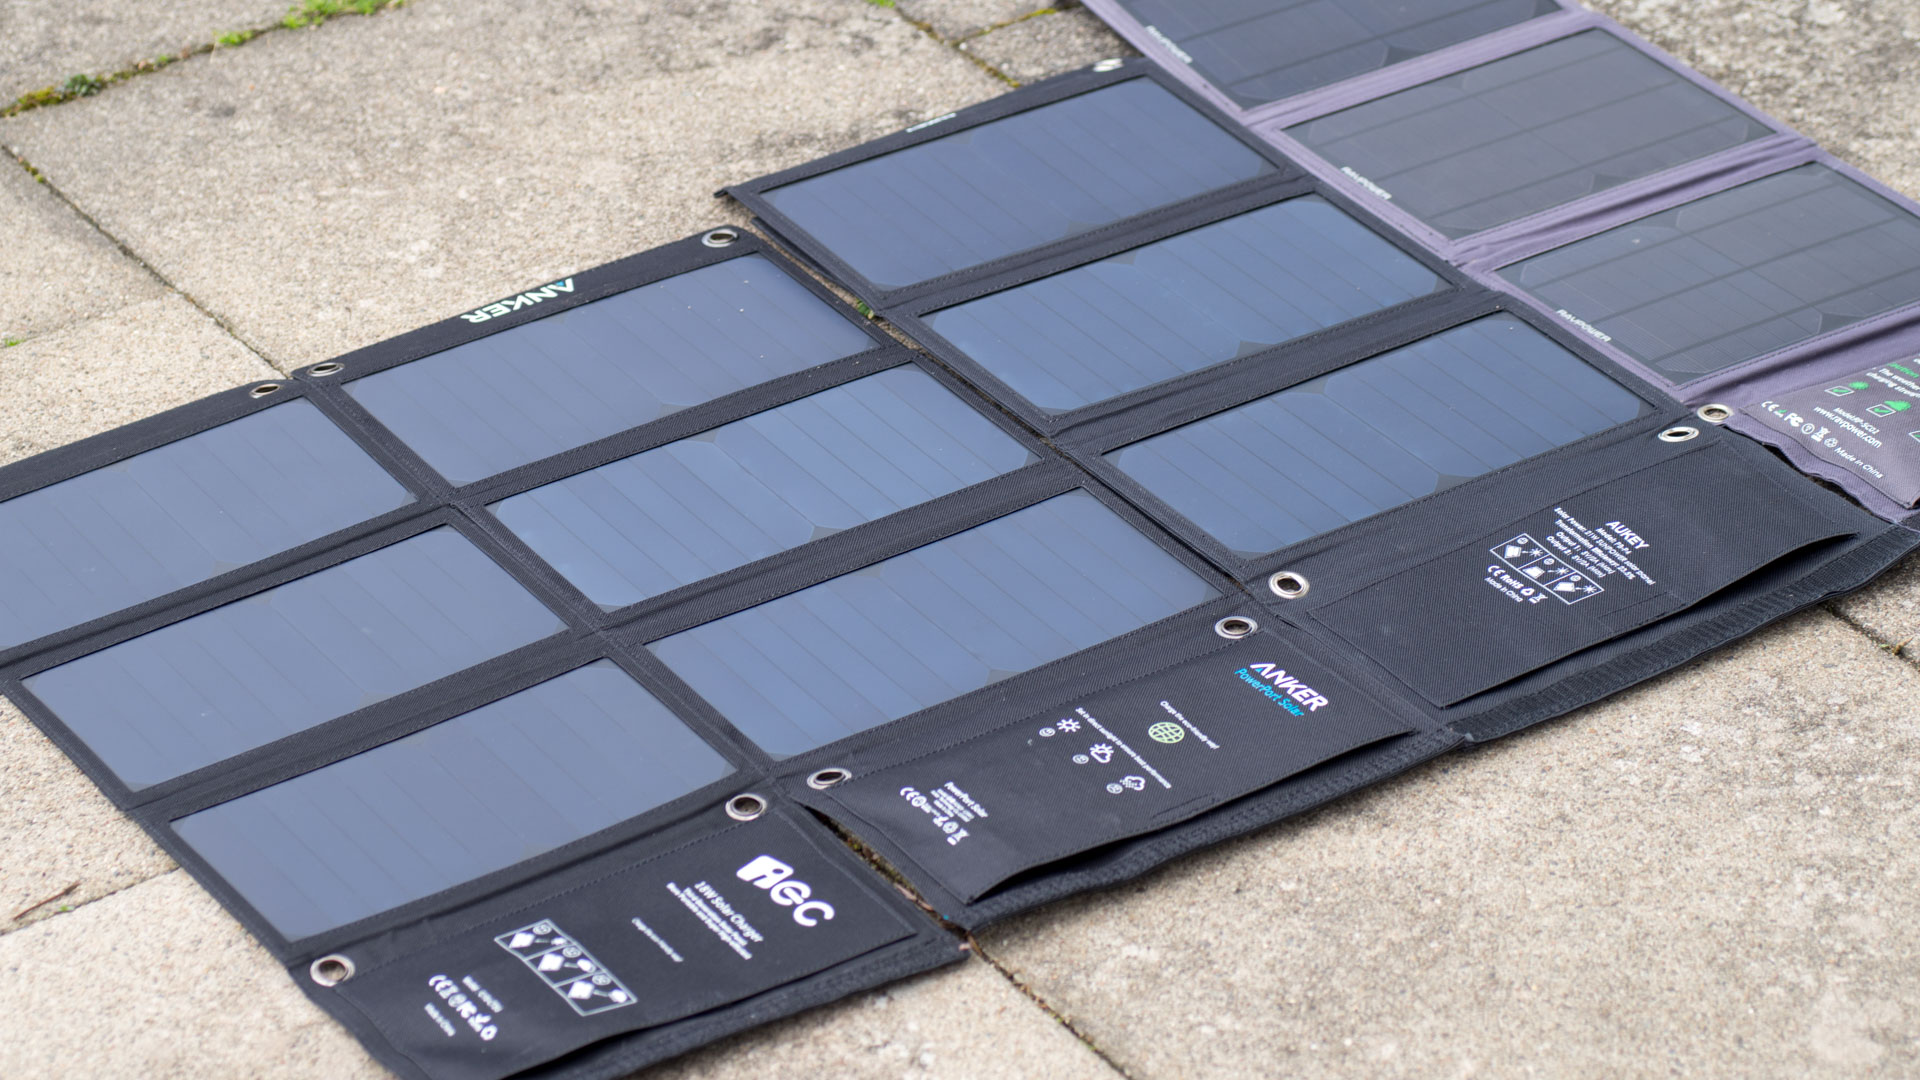 das anker powerport 21w usb solarladeger t im test techtest. Black Bedroom Furniture Sets. Home Design Ideas